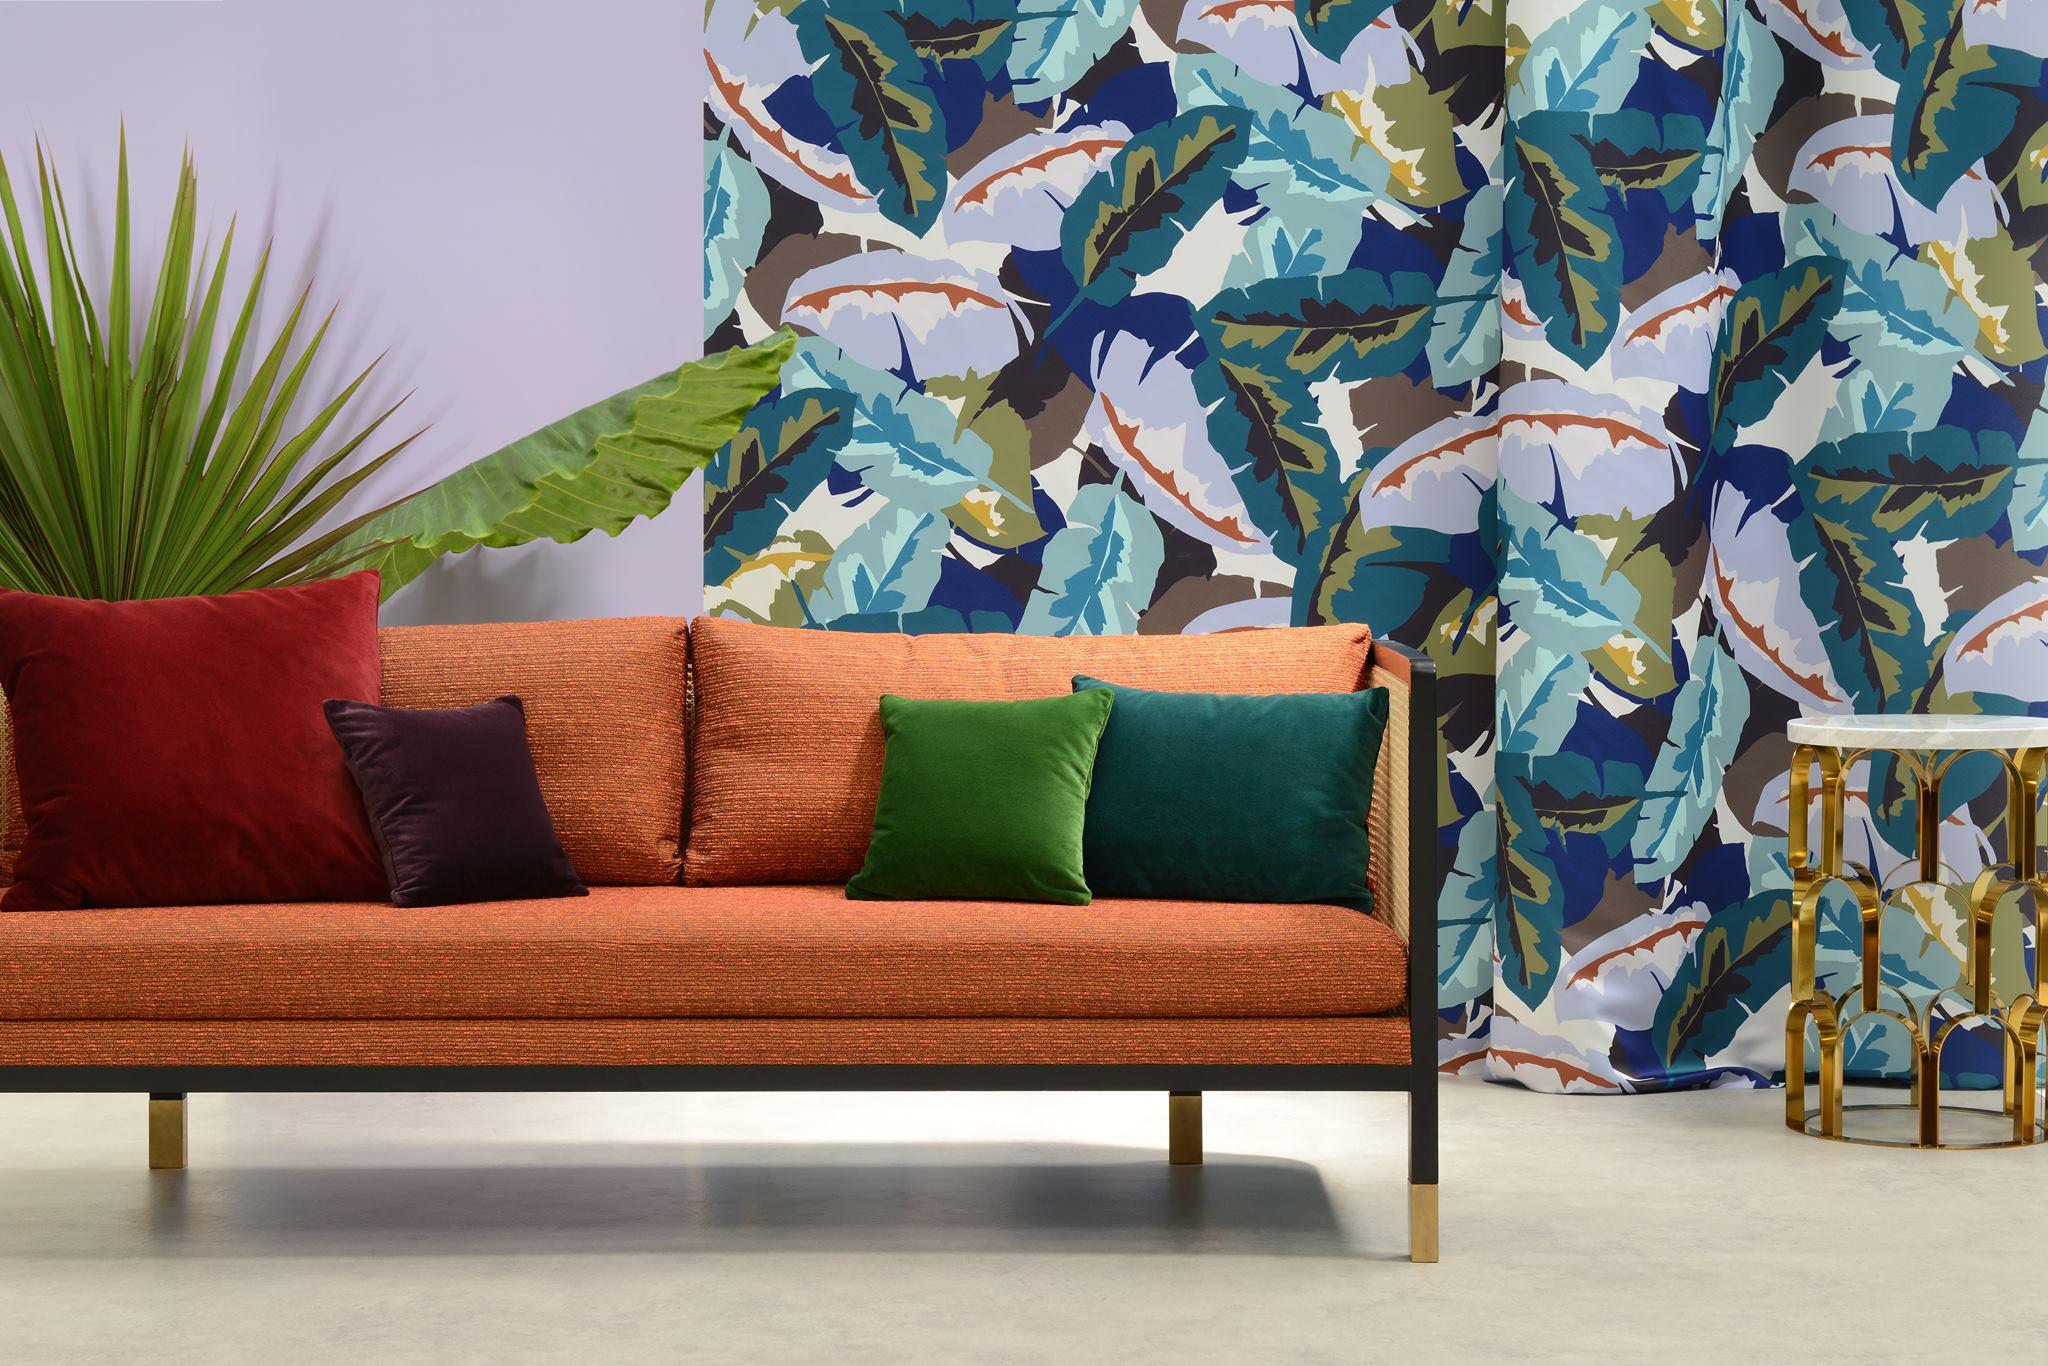 rideaux voilages besan on bouvard tapissier d corateur besan on. Black Bedroom Furniture Sets. Home Design Ideas